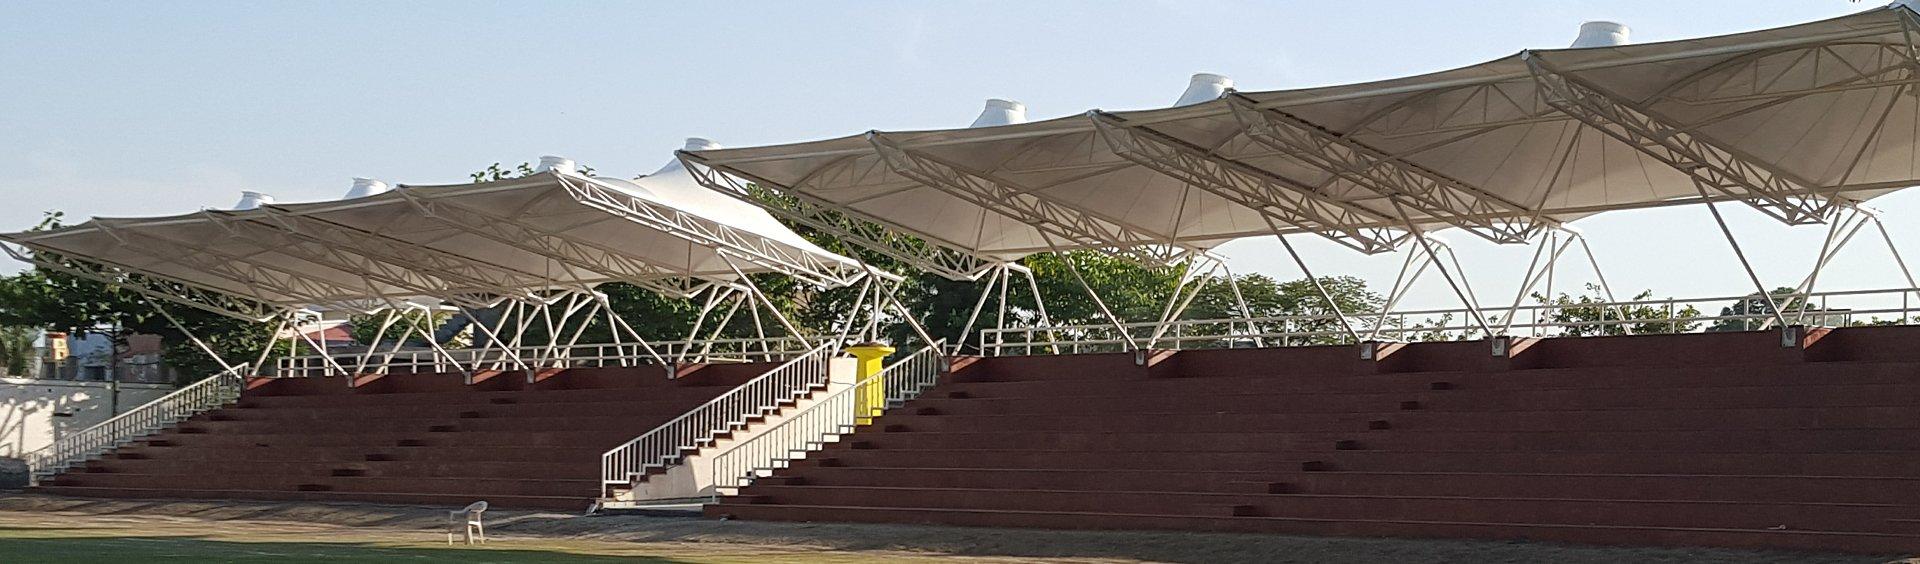 Tensile Membrane Structures Tensile Membrane Roof Installation u0026 Solutions Mumbai India - Aakruti Tenso Structures u0026 Facades Pvt. Ltd. & Tensile Membrane Structures Tensile Membrane Roof Installation ... memphite.com